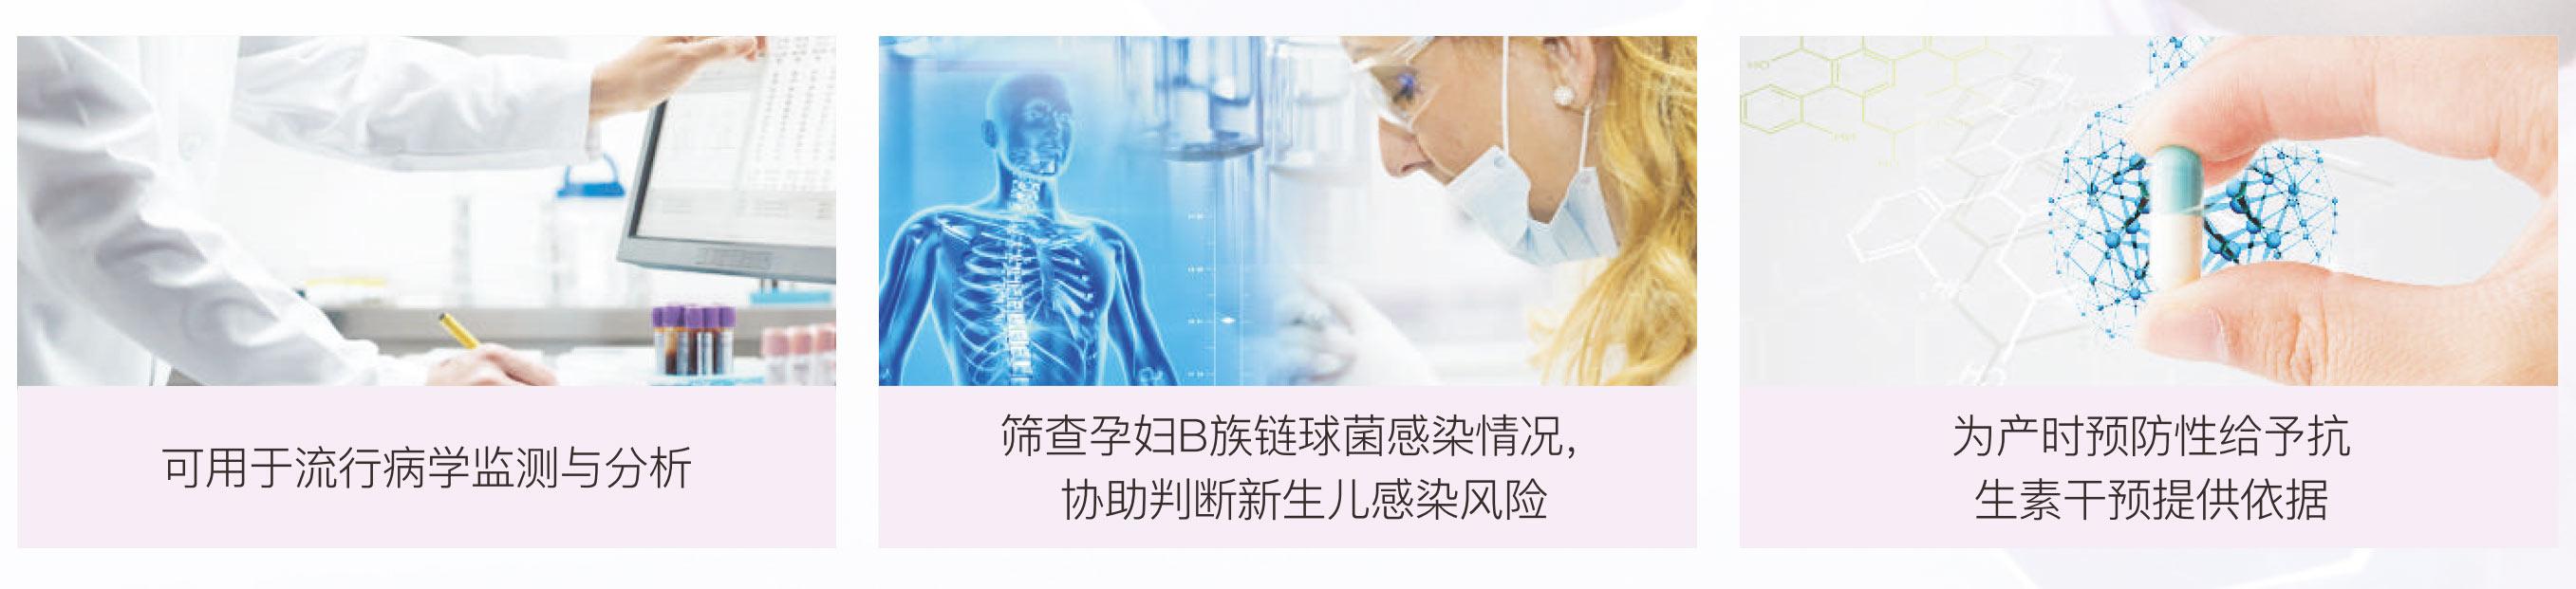 B族链球菌(GBS)核酸检测试剂盒(荧光PCR法)